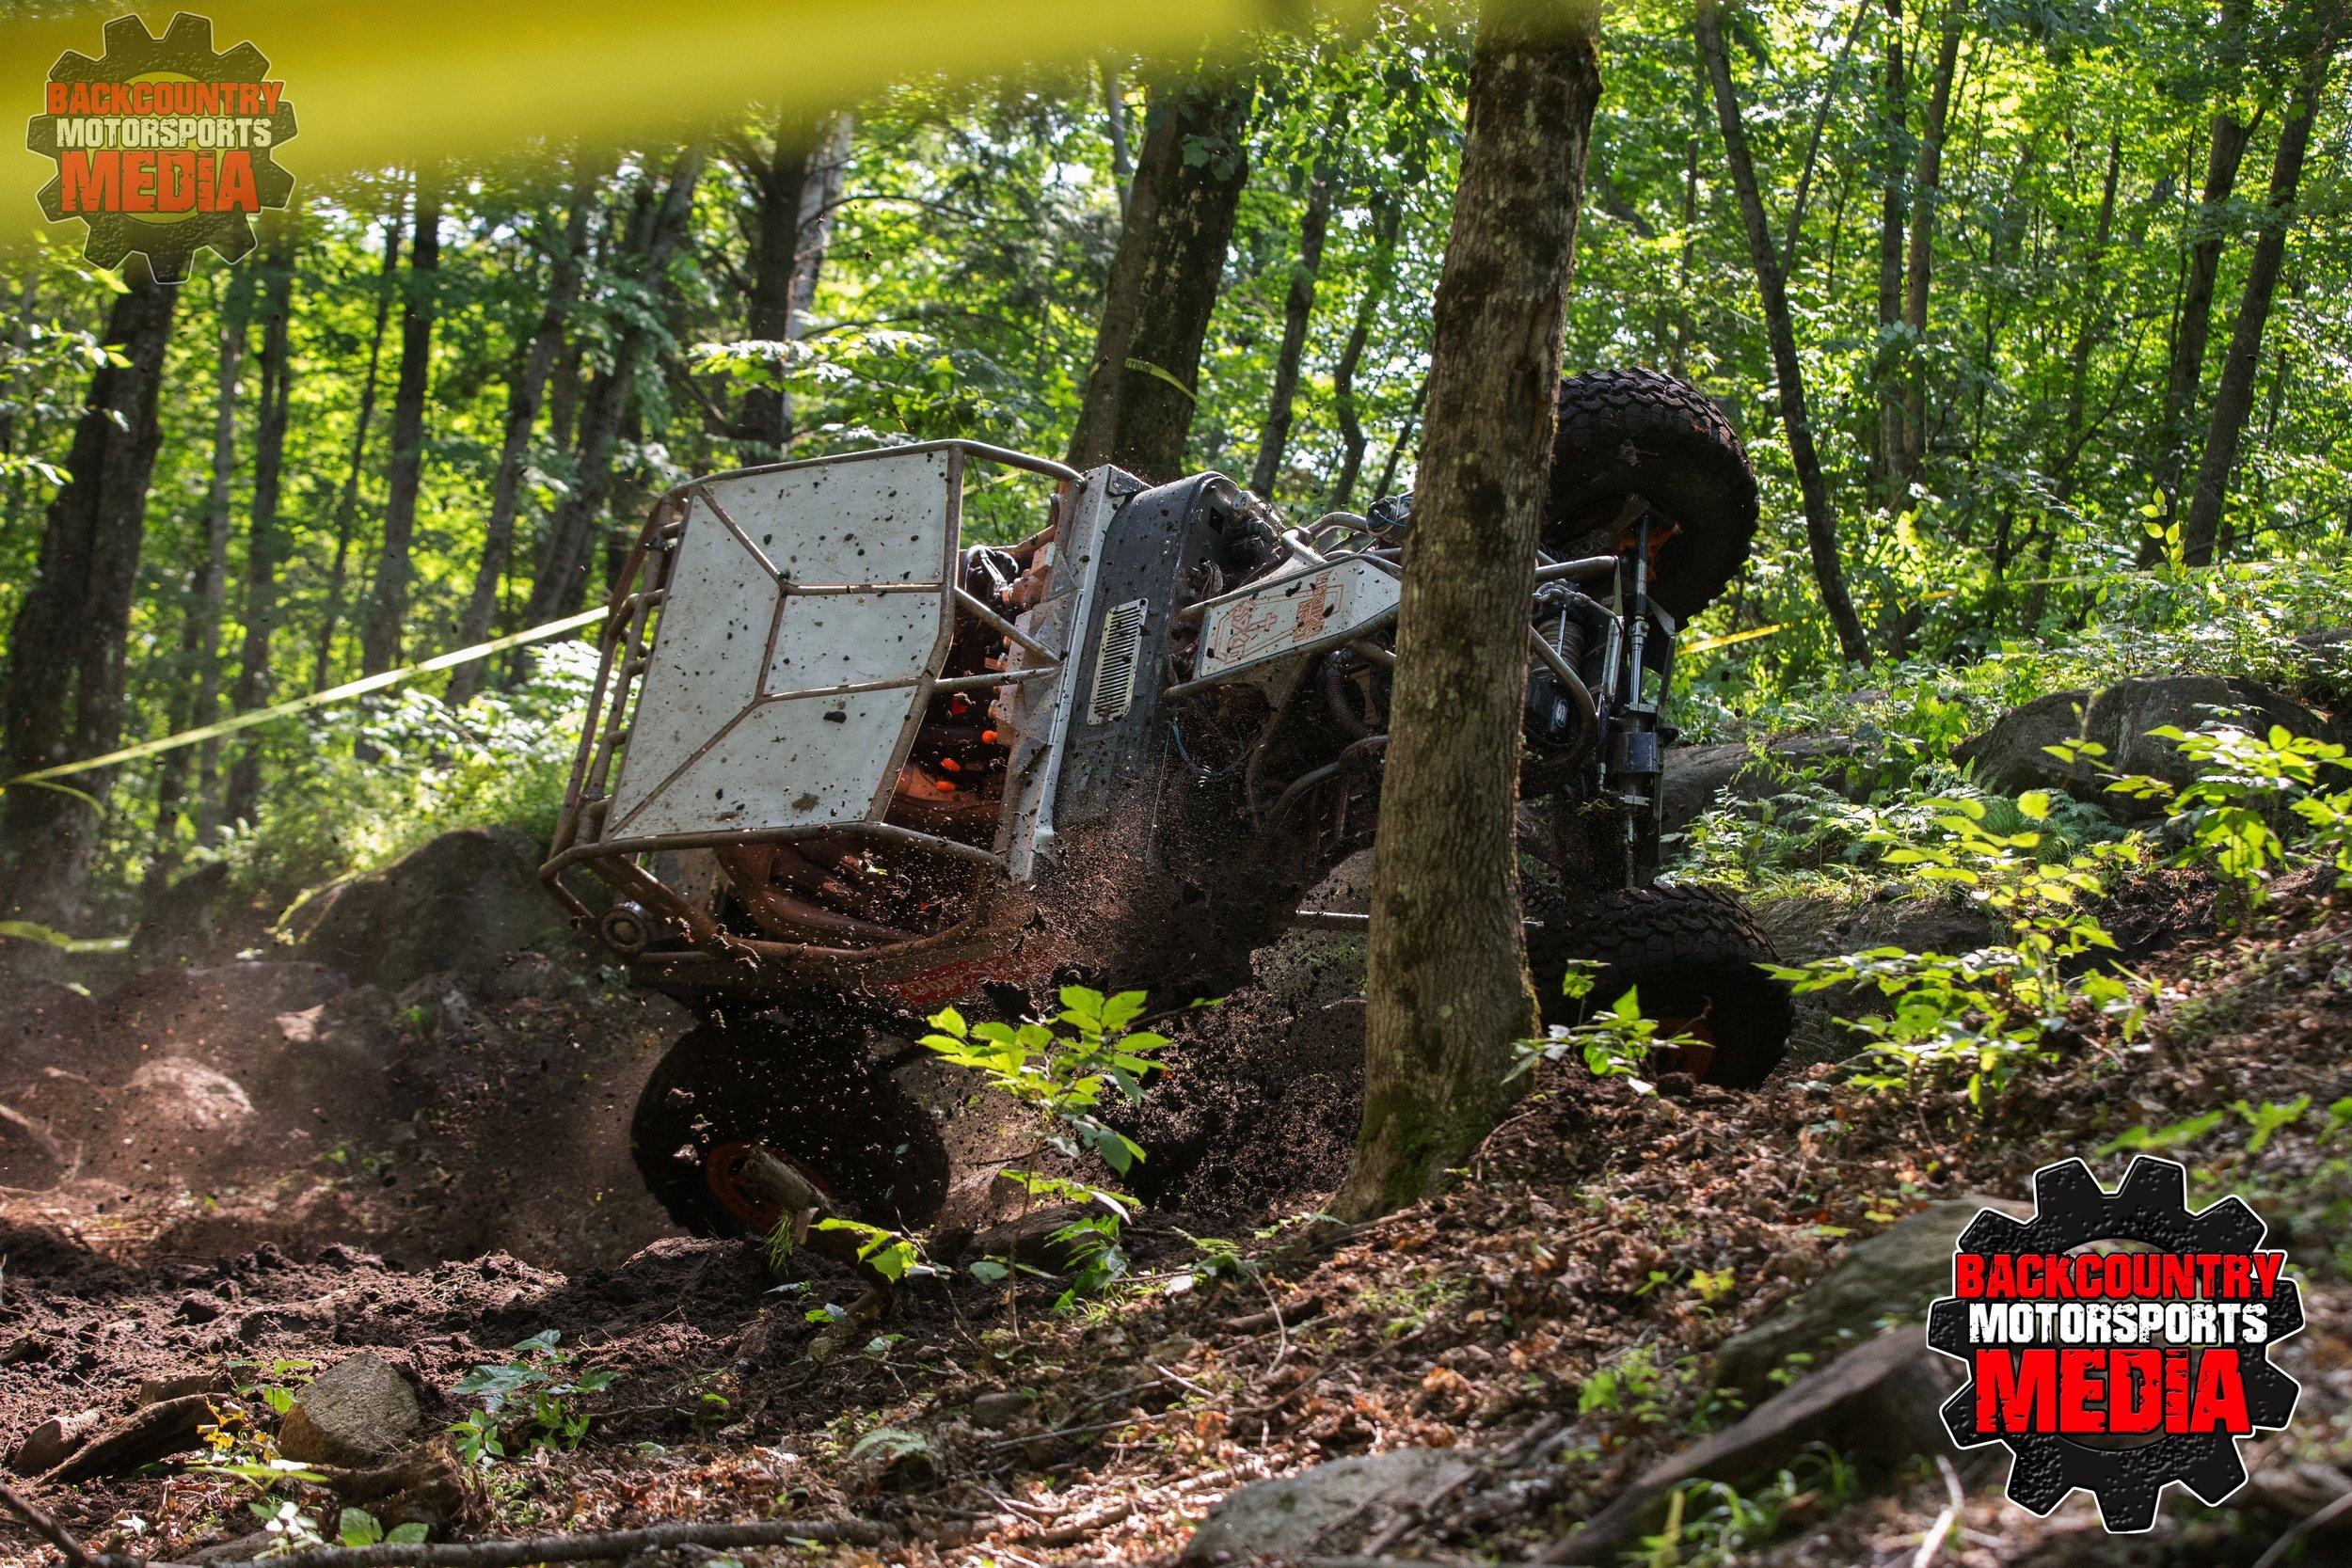 King of the Shield 2017 TMR Customs Off-Road Racing Series